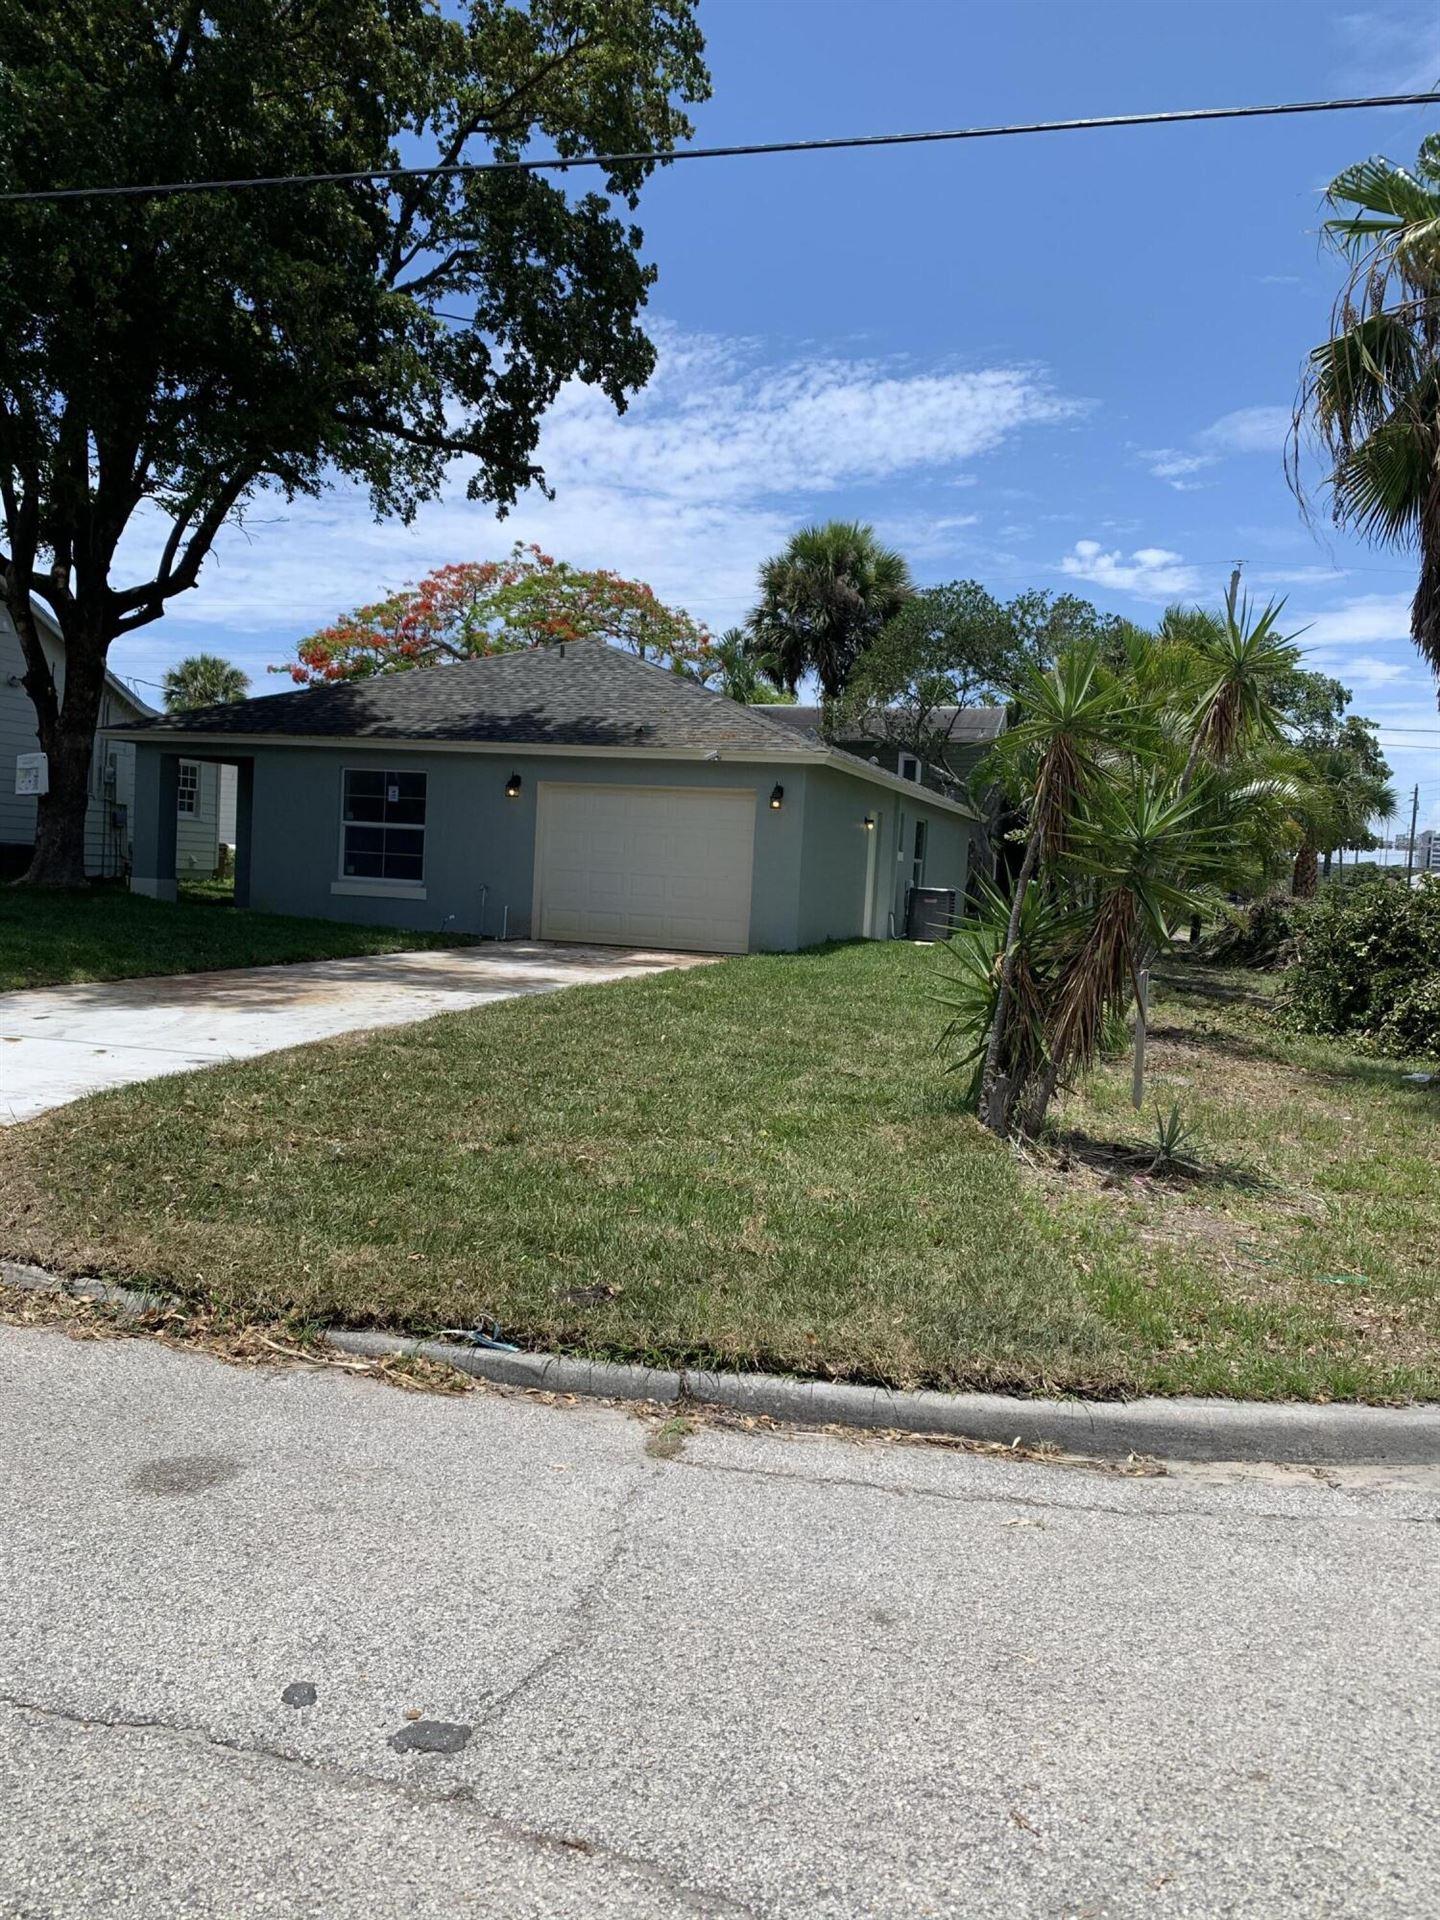 Photo of 1290 Alpha Street, West Palm Beach, FL 33401 (MLS # RX-10726479)